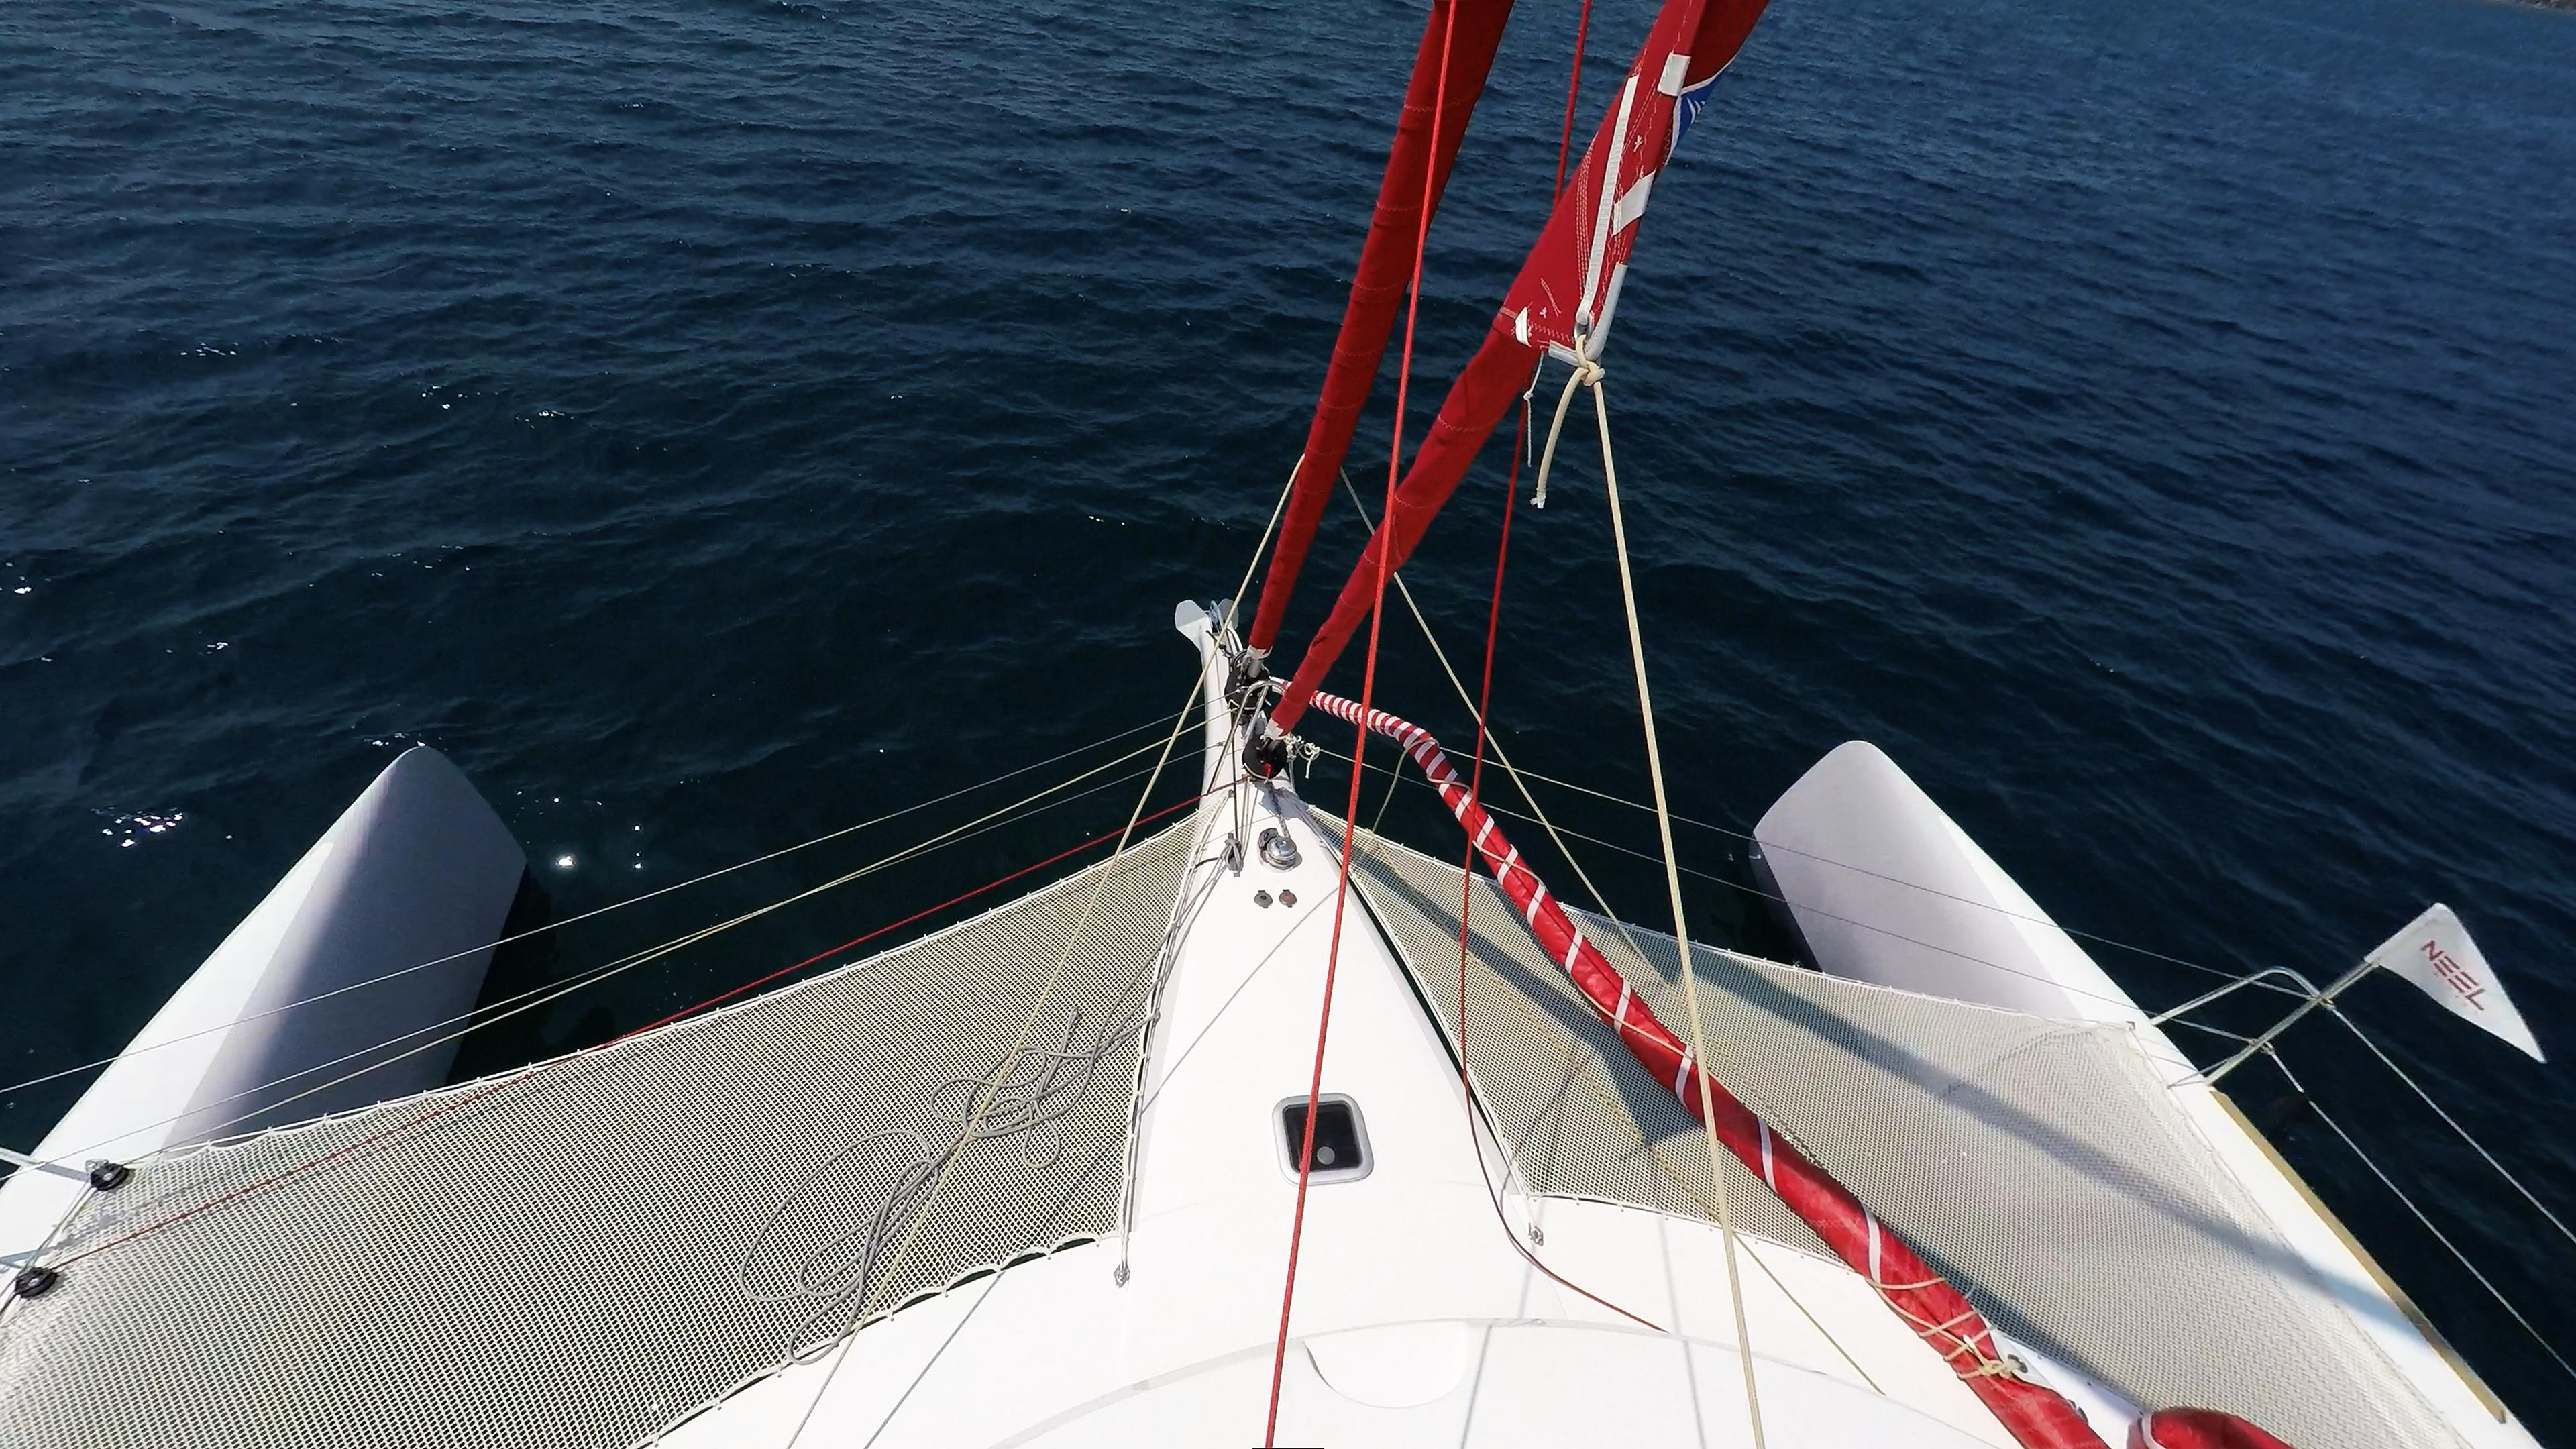 prua di multiscafo a vela neel 45